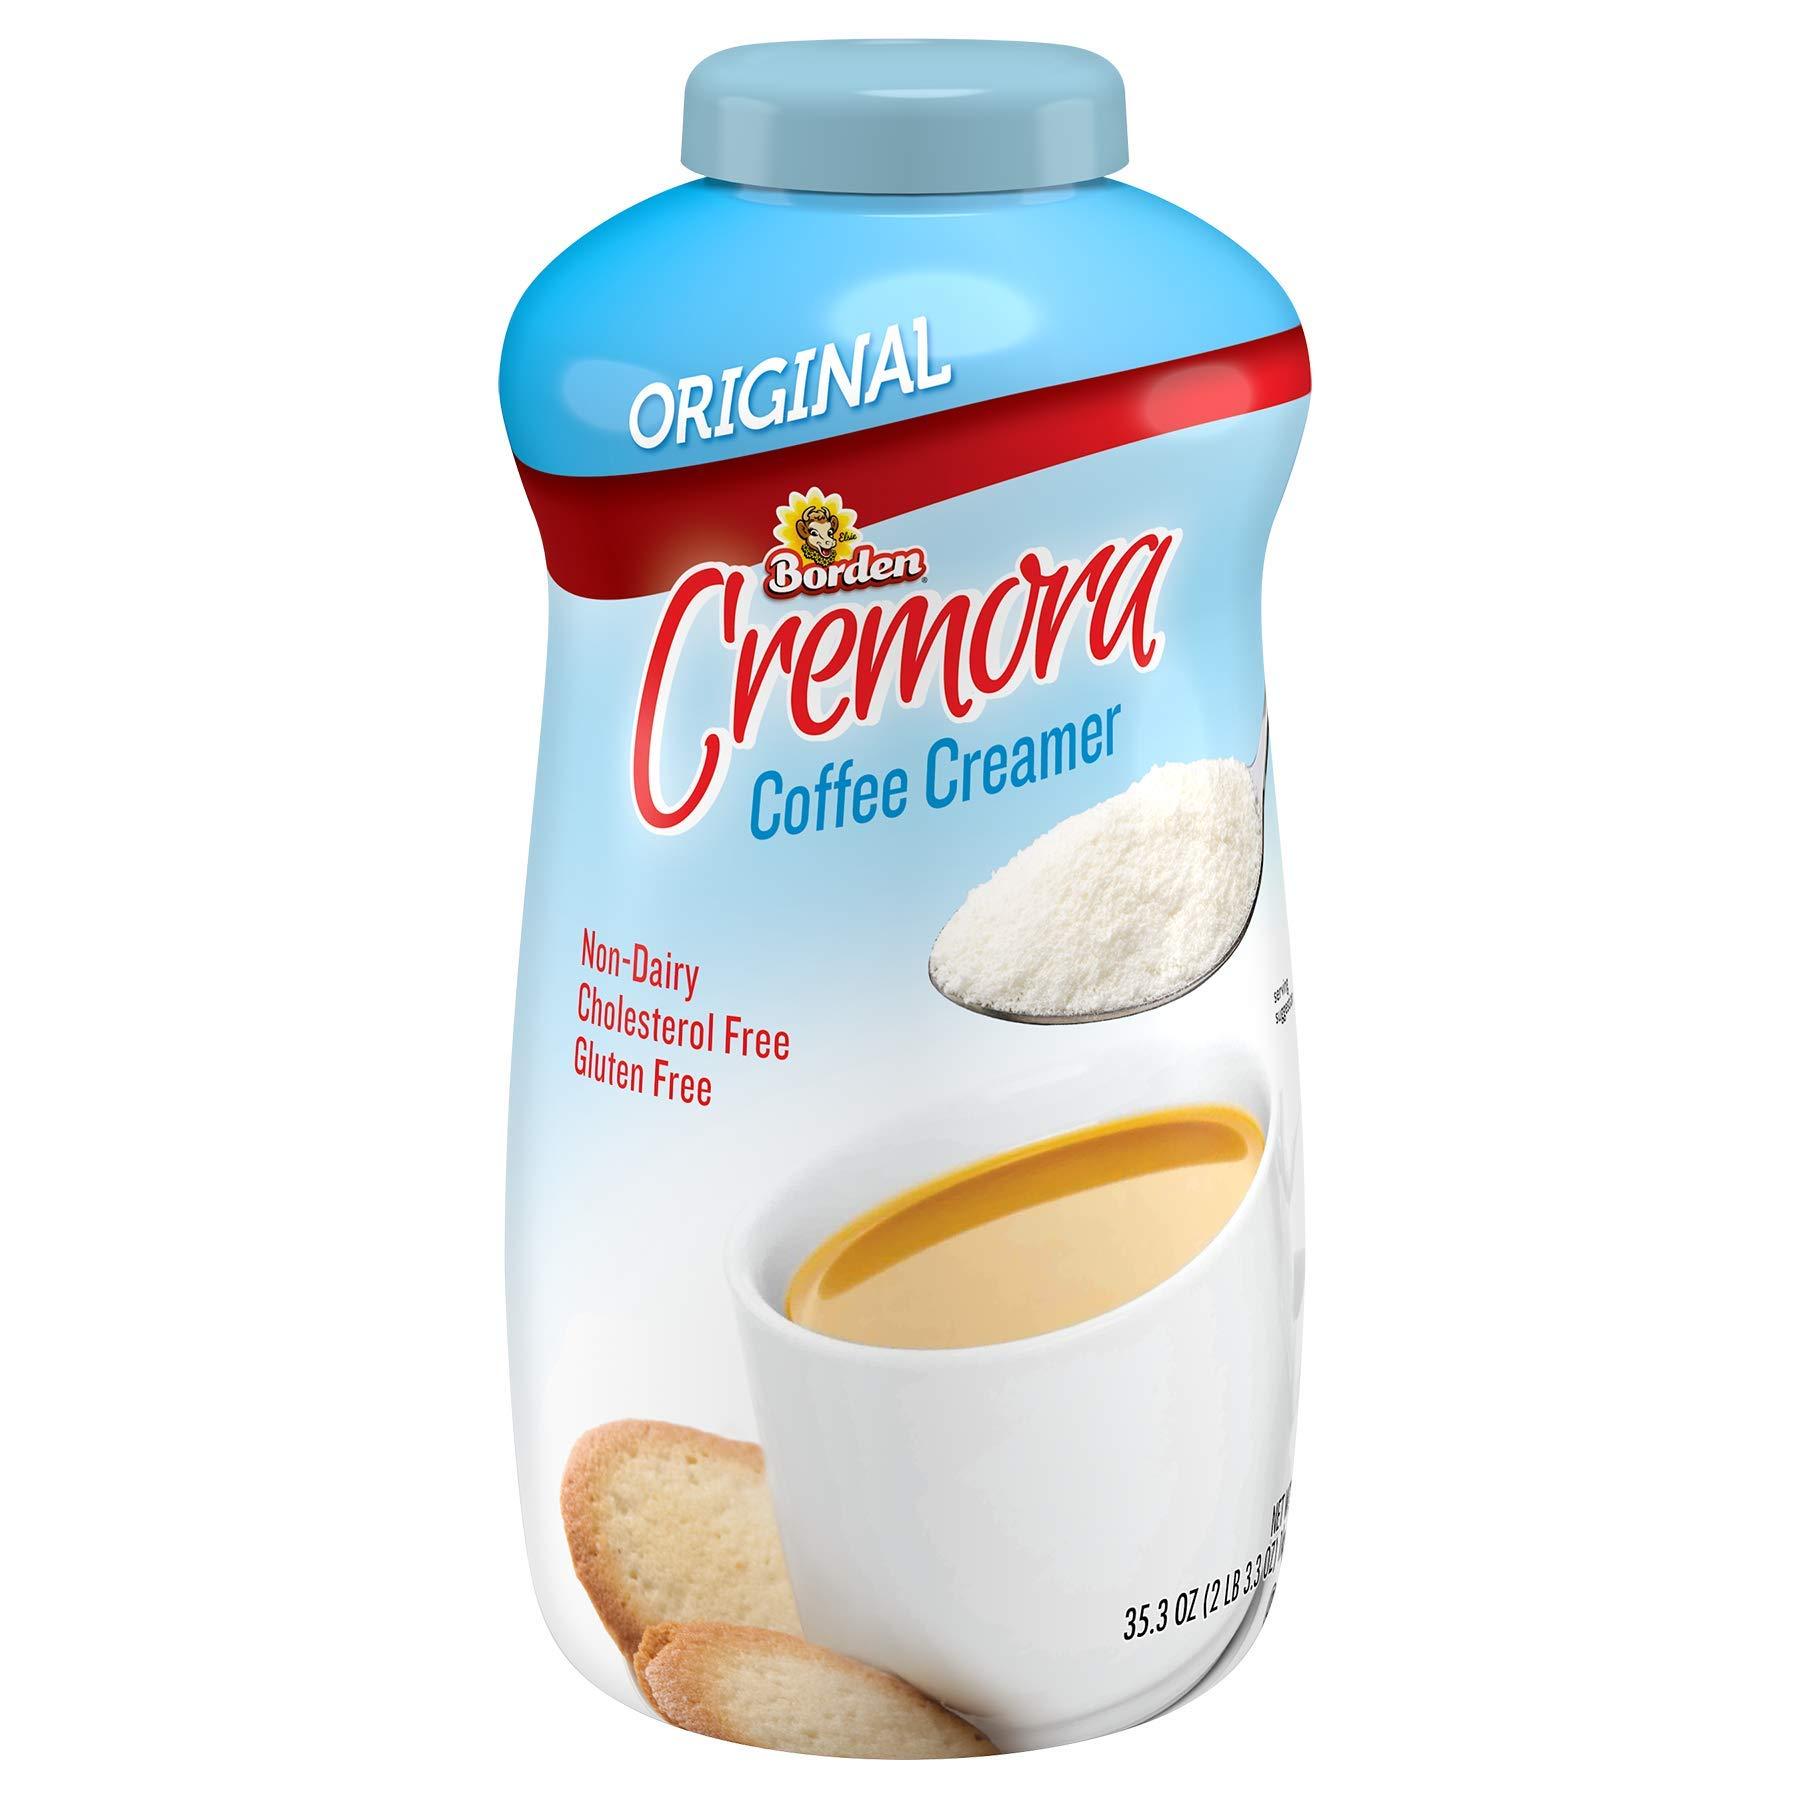 Borden Cremora Coffee Creamer, 2.206 Pound (Pack of 6)